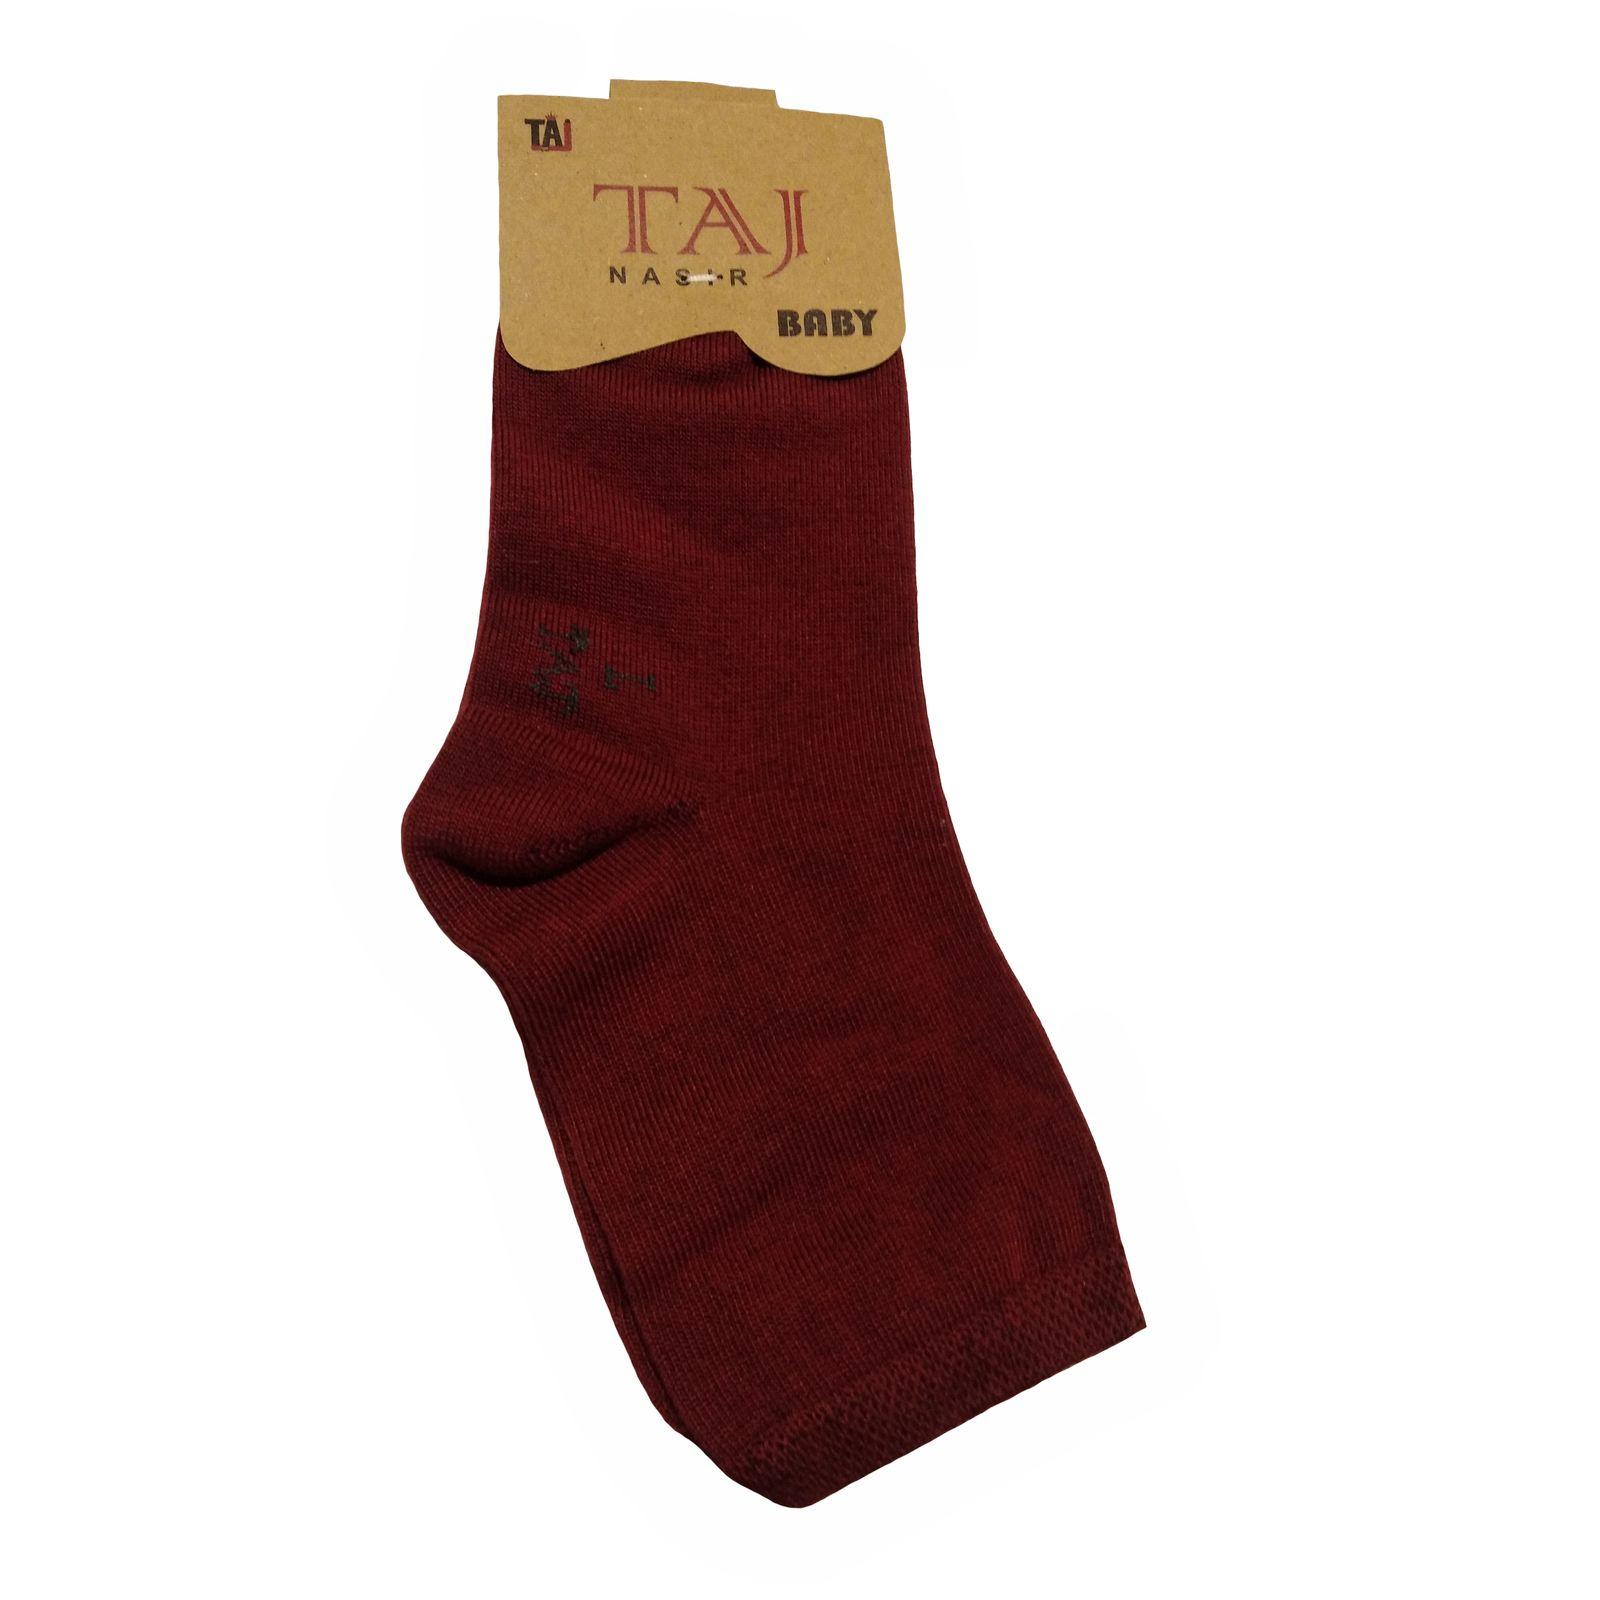 جوراب بچگانه تاج مدل P-1 -  - 3